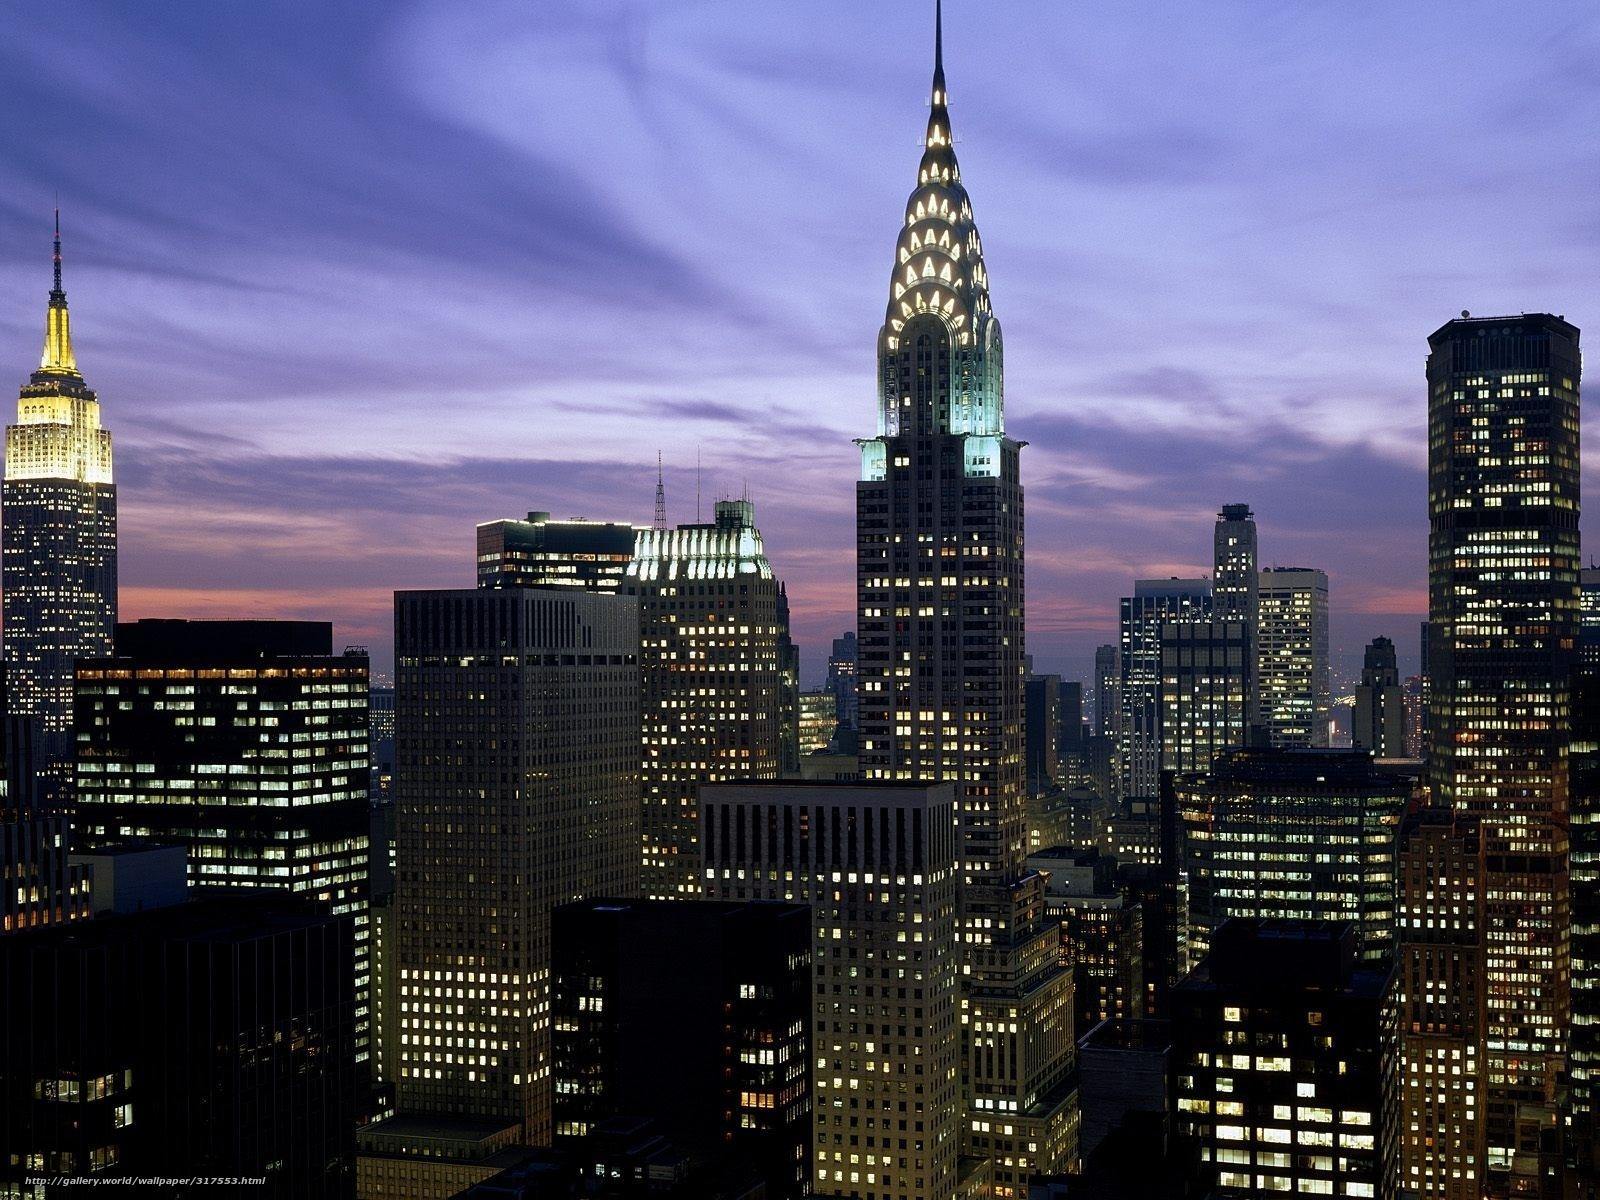 wallpaper night new york city chrysler building lights desktop 1600x1200